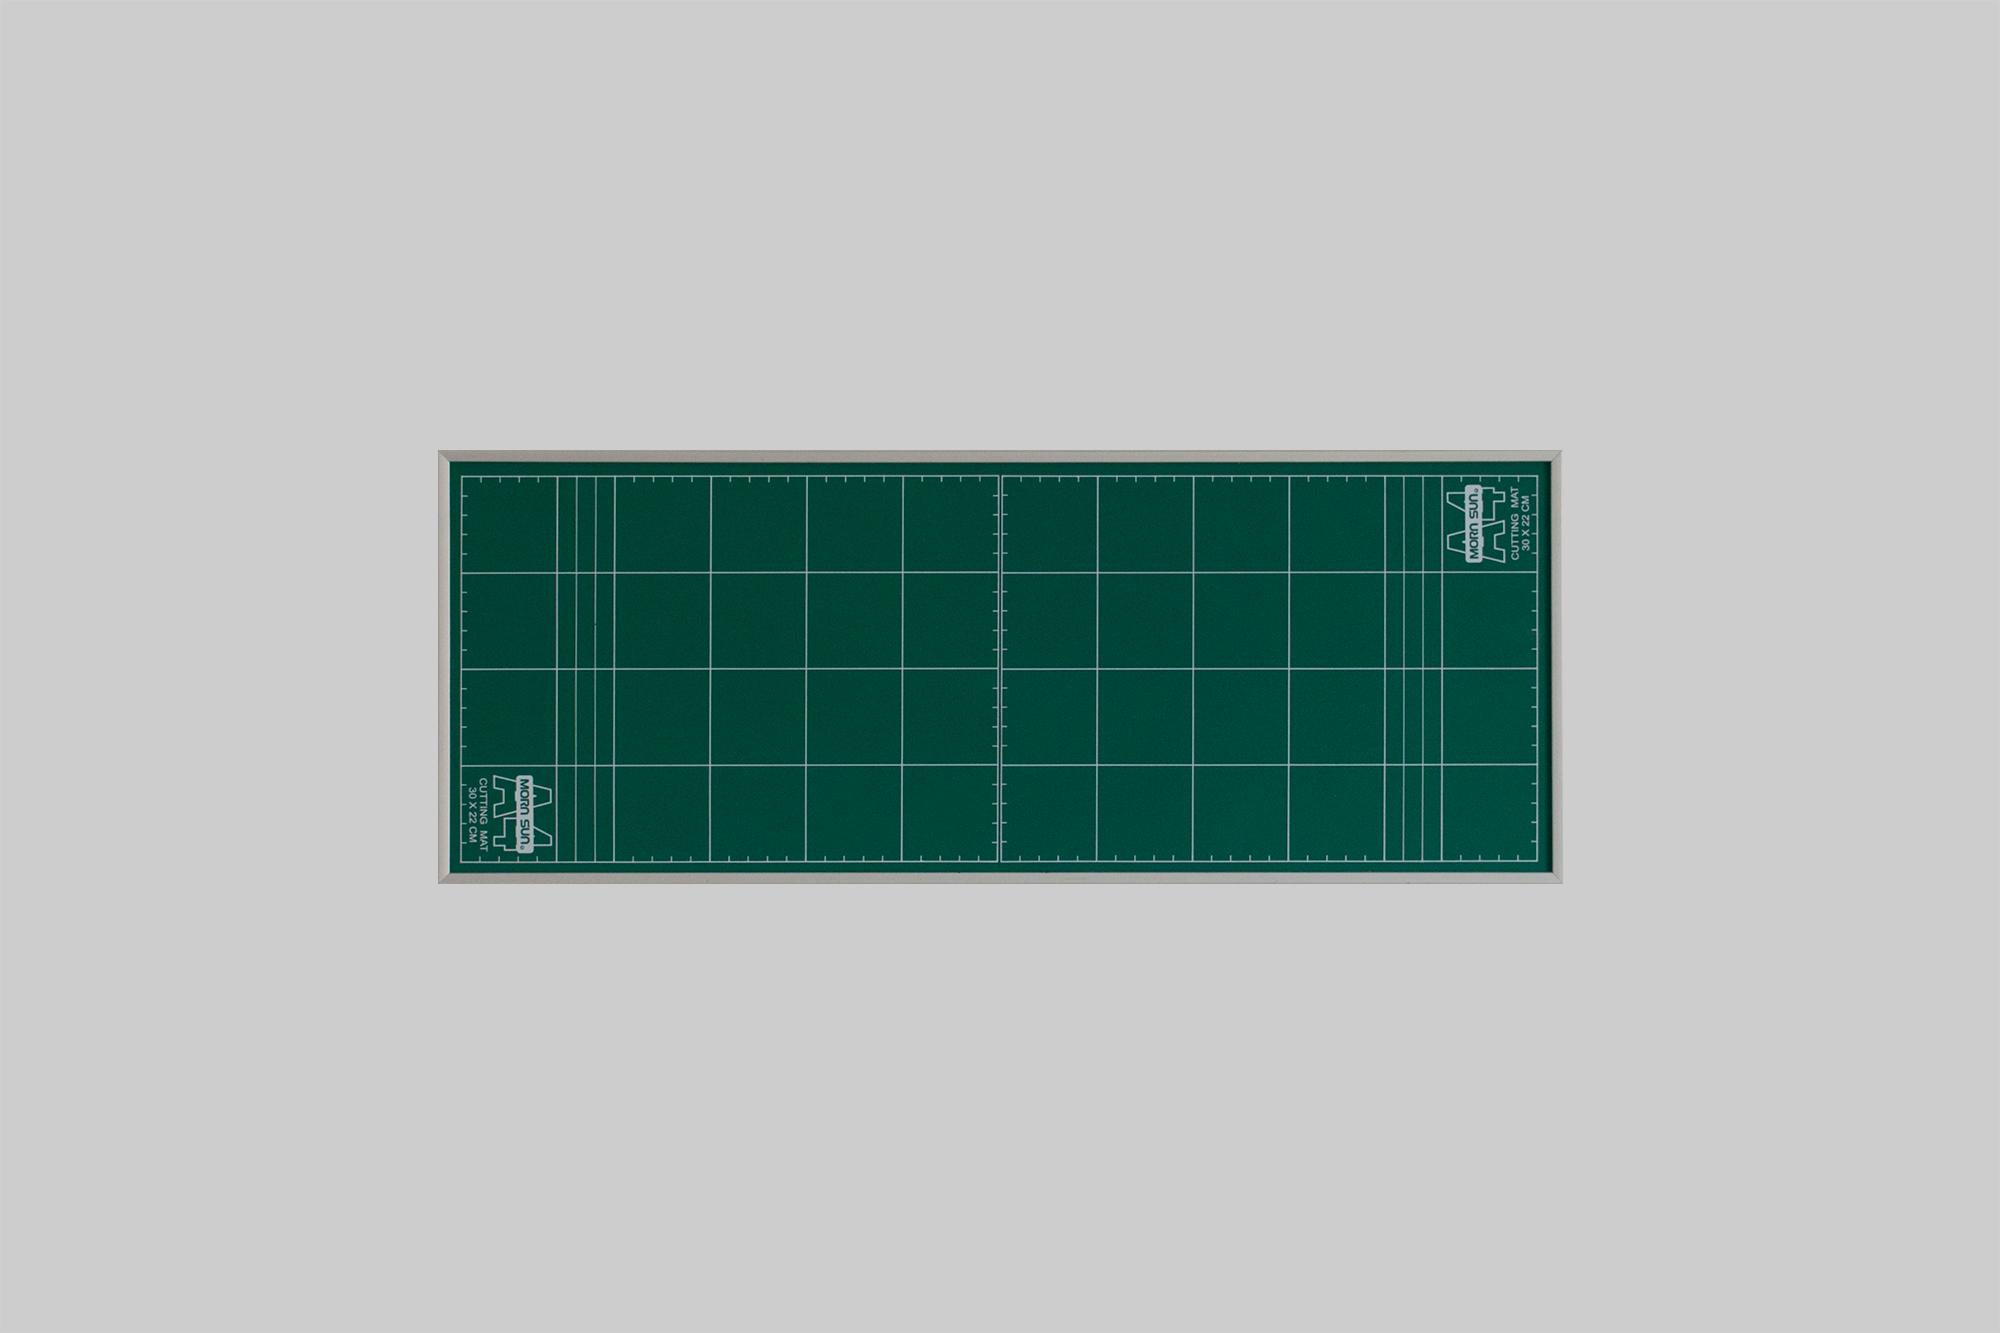 Liber-May_Play-Board-IV_frontal-view.png